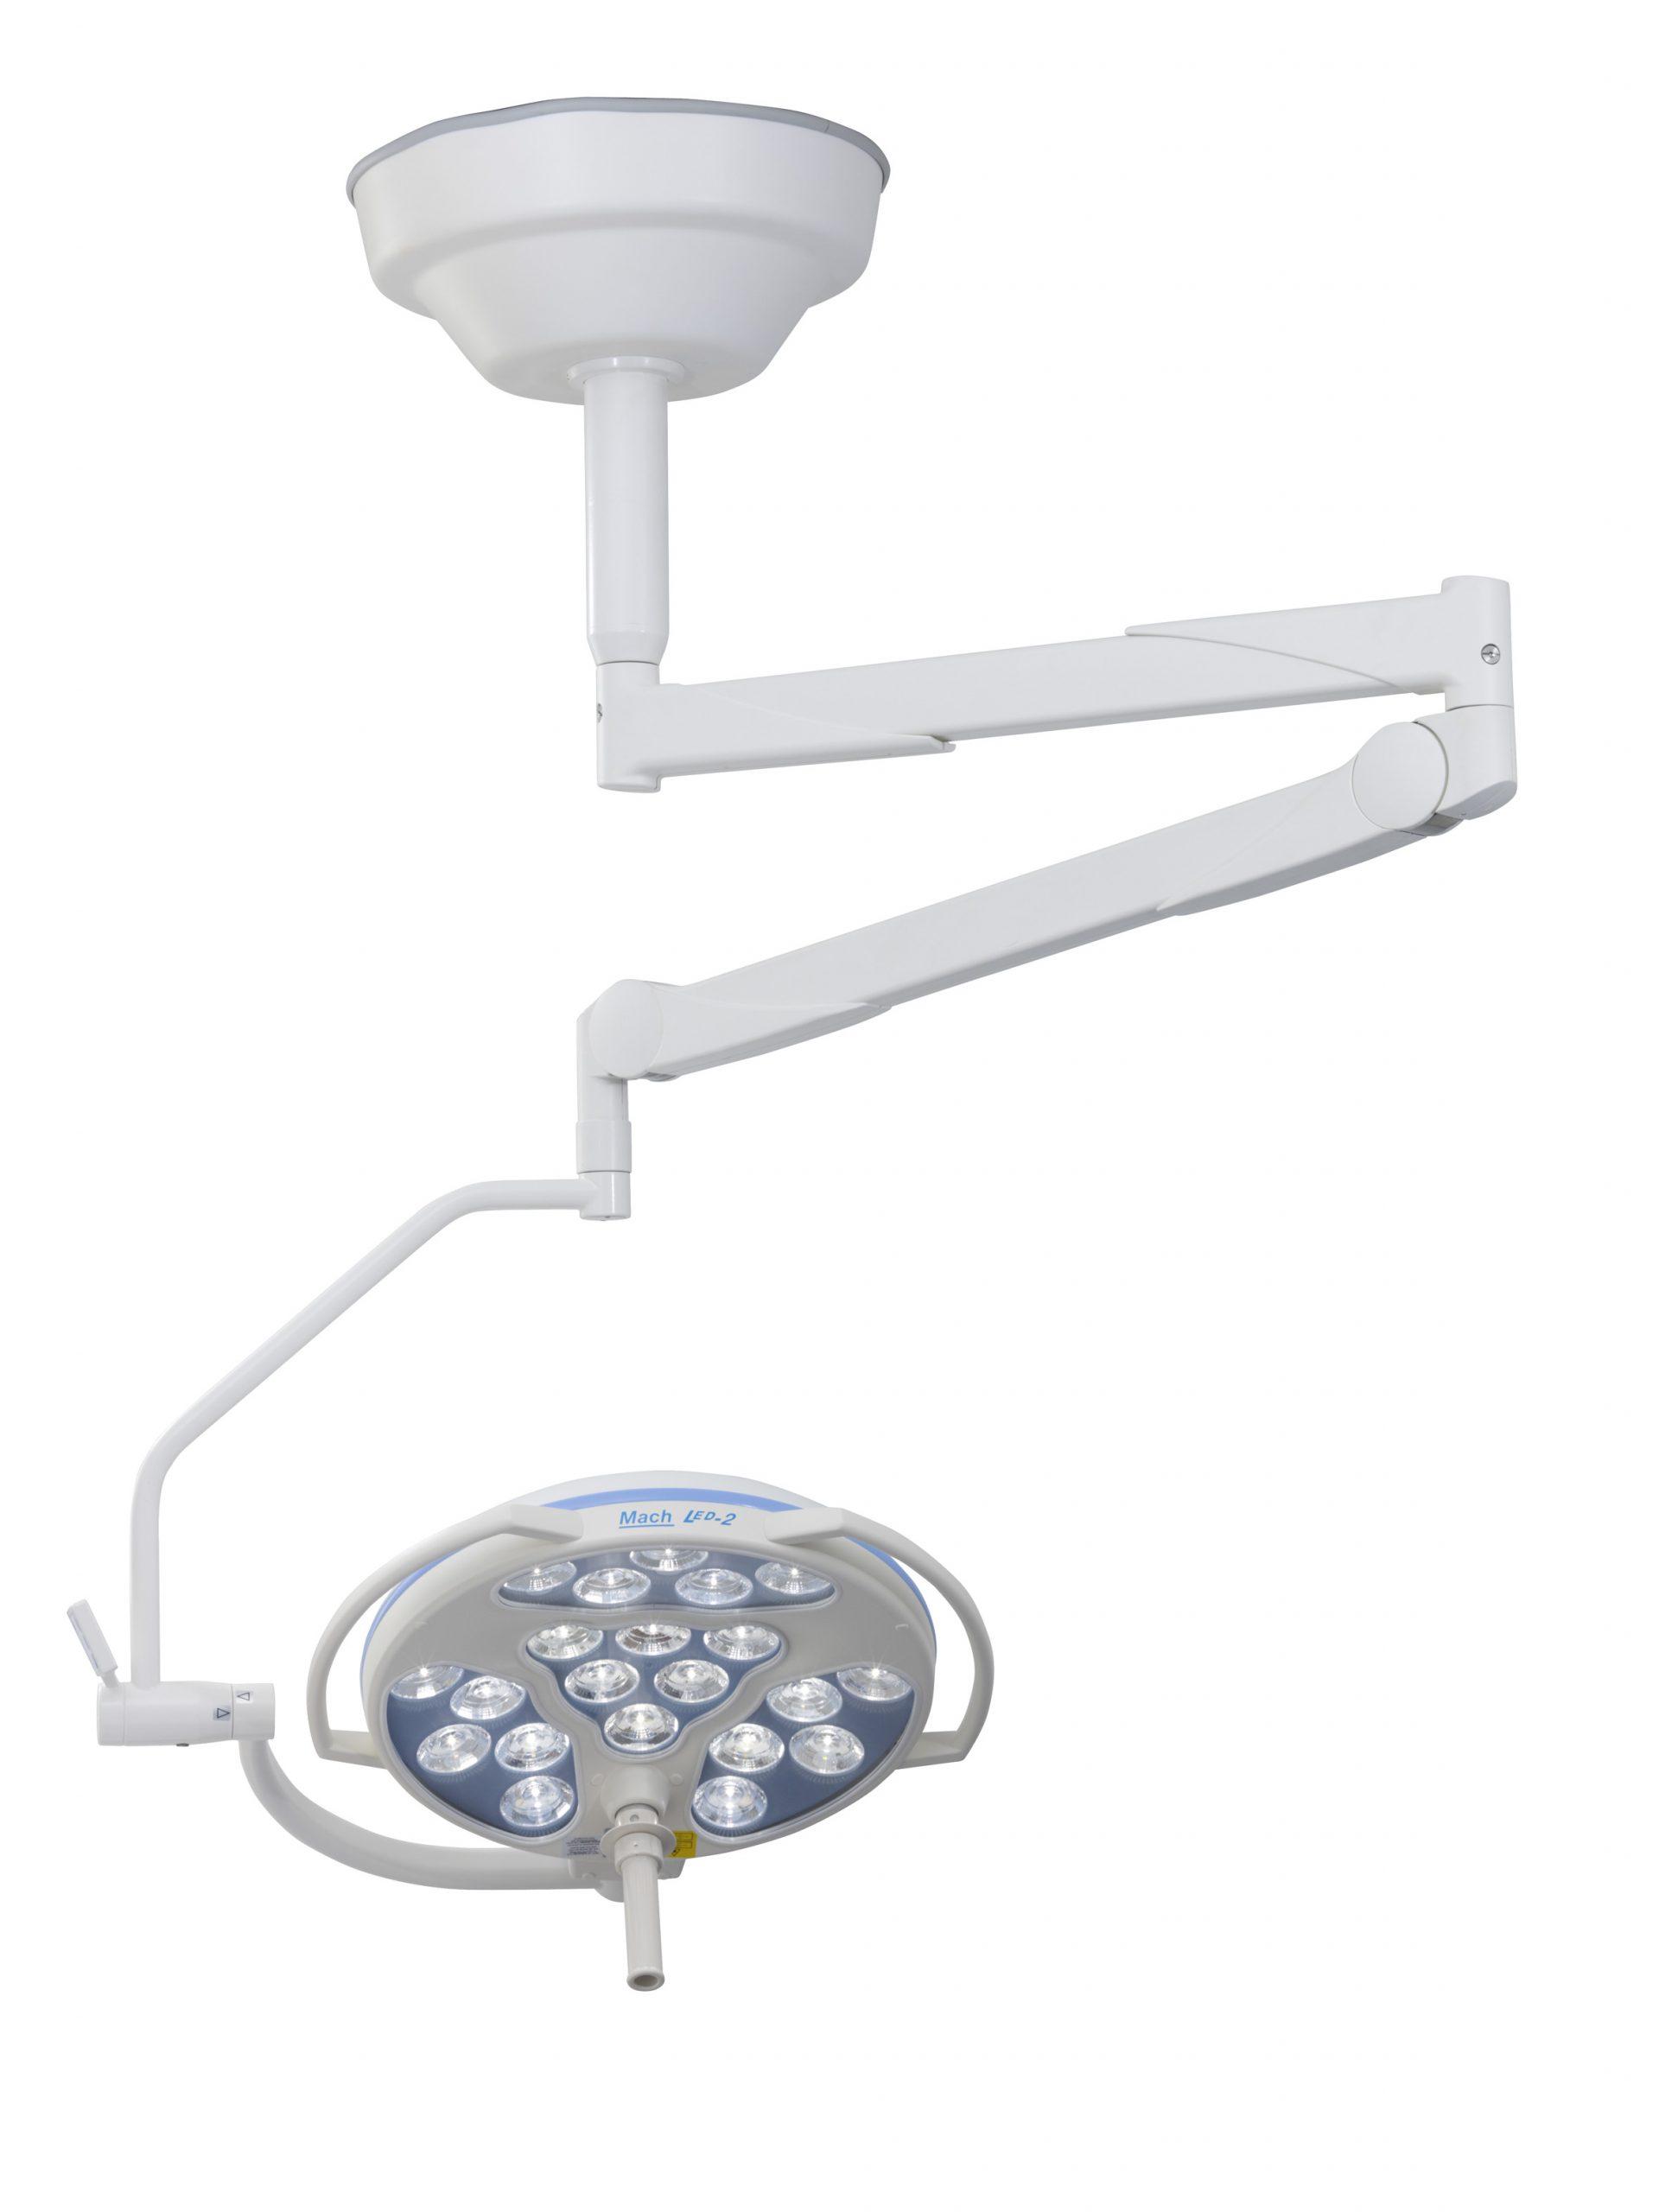 Onderzoekslamp-LED2-normale-plafondhoogte-Cardan-beugel